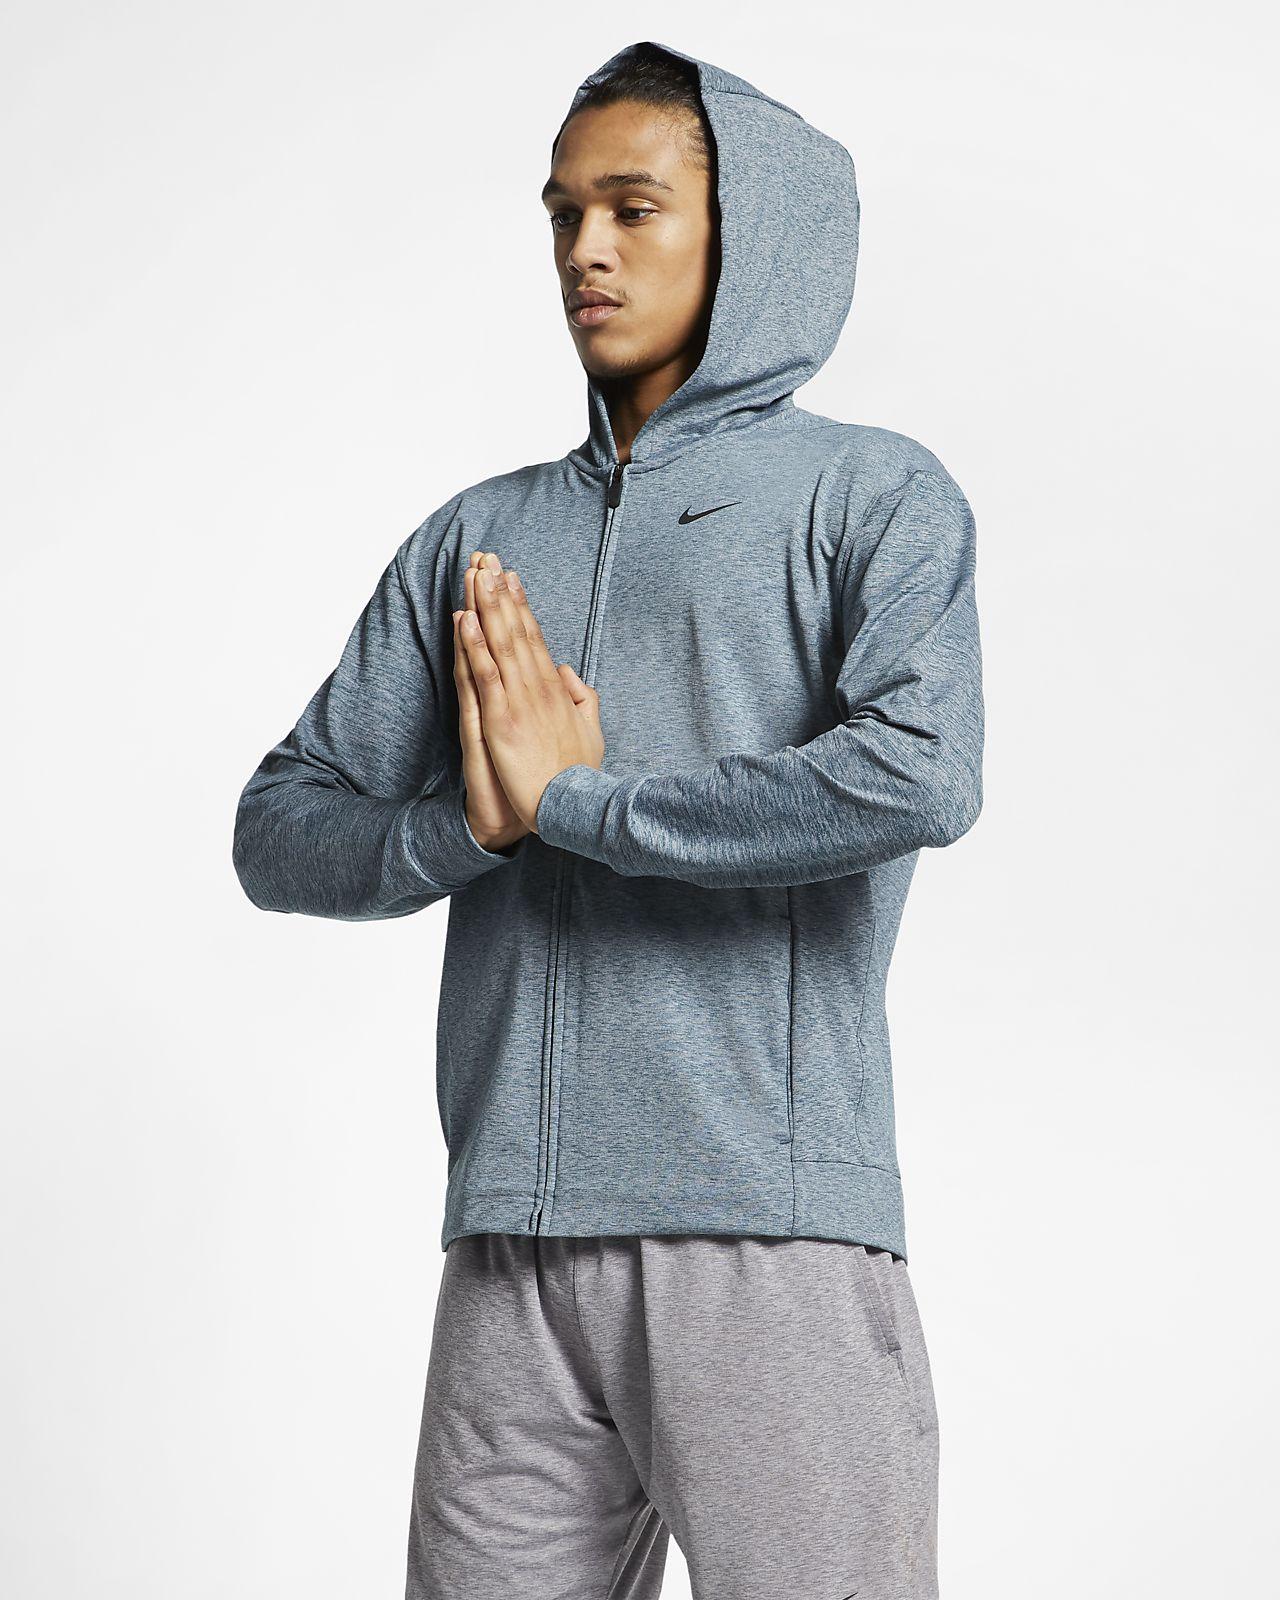 0418a5d2 Nike Dri-FIT Men's Full-Zip Yoga Training Hoodie. Nike.com